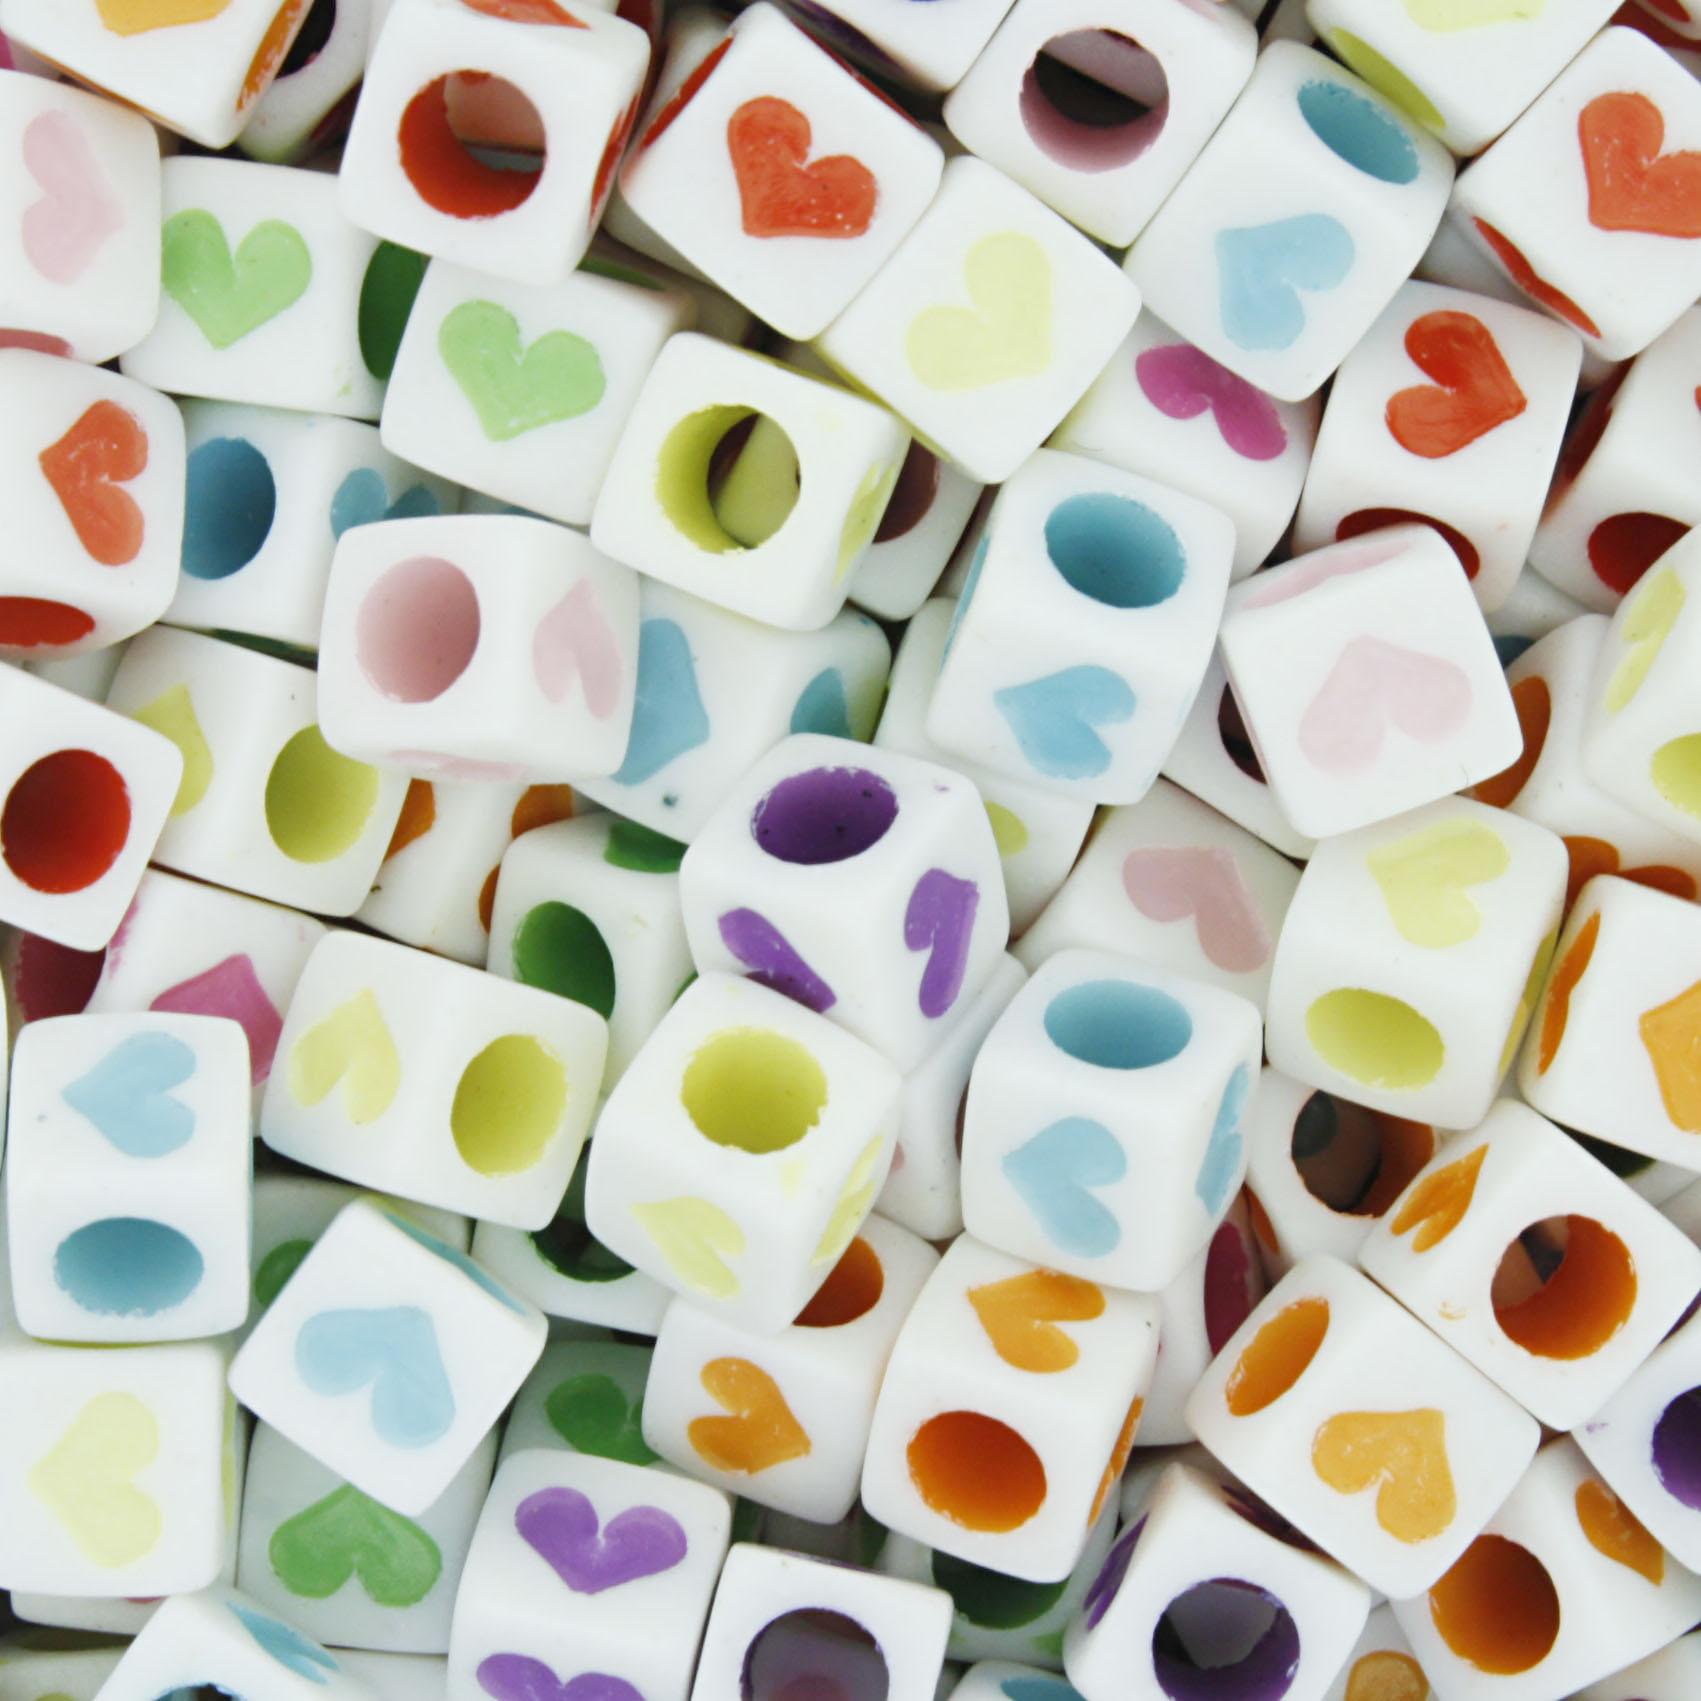 Miçanga Colorida / Infantil - Cubo Corações  - Stéphanie Bijoux® - Peças para Bijuterias e Artesanato